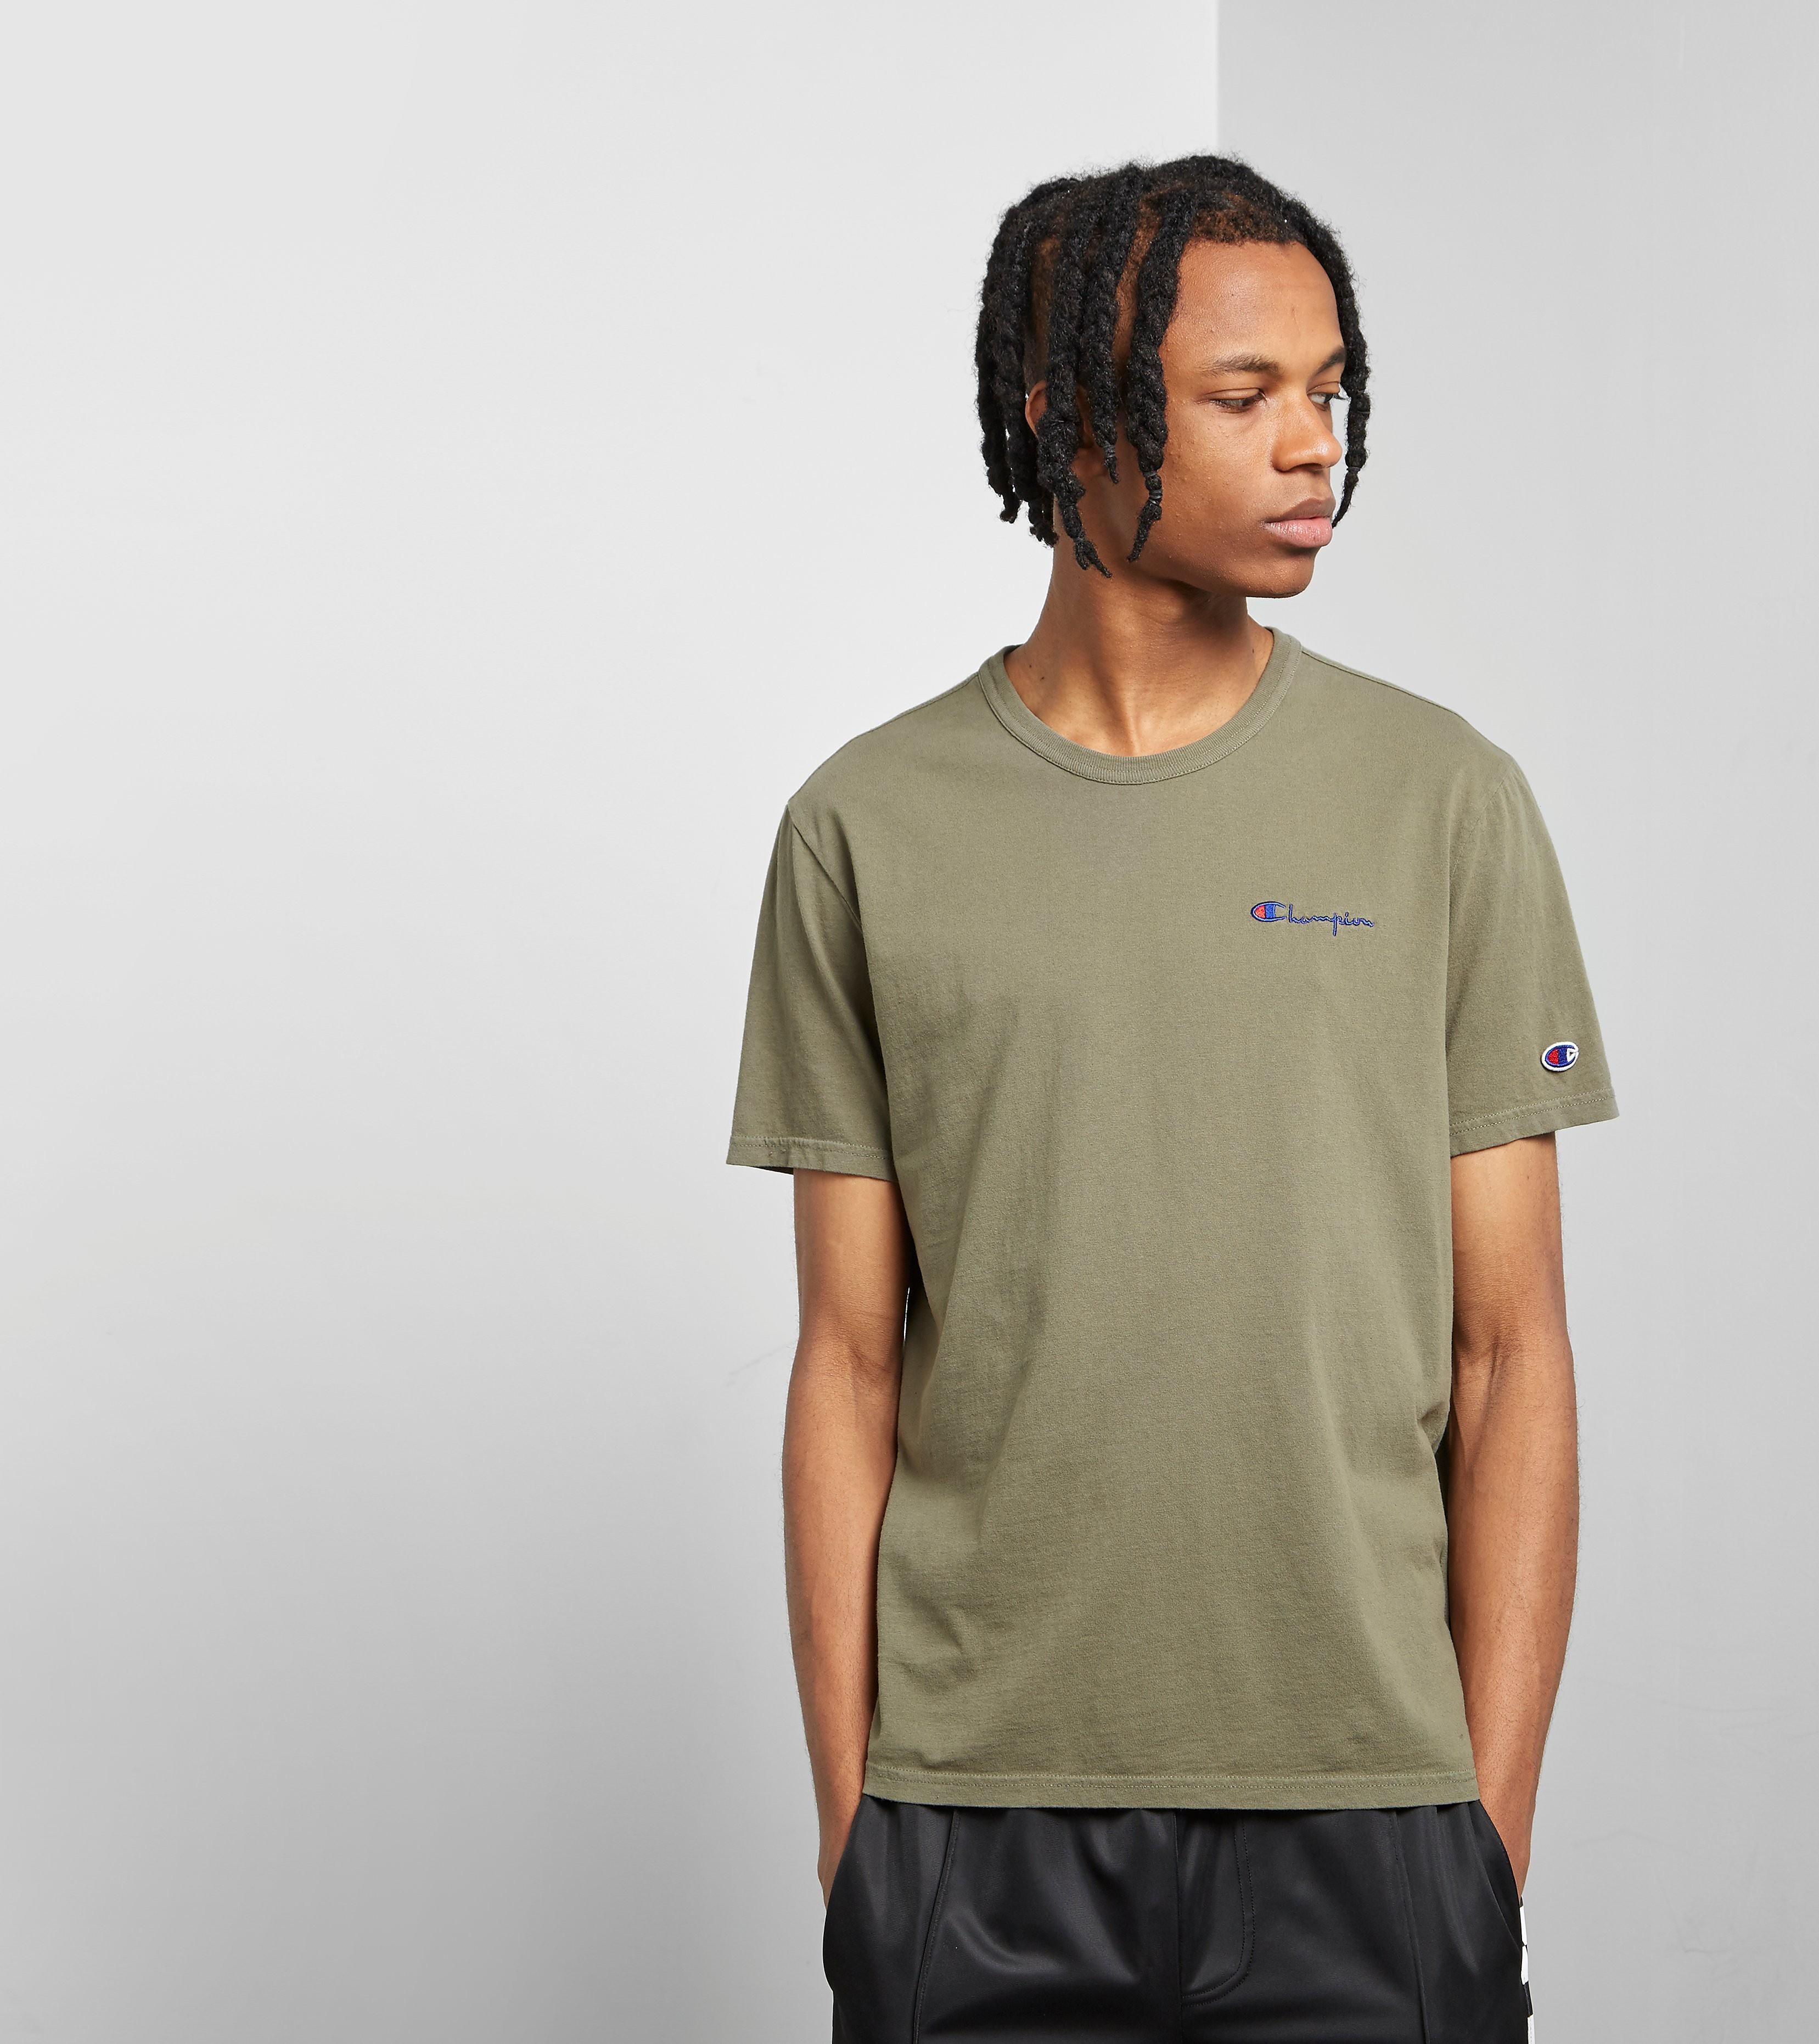 Champion GD T-Shirt size? Exclusive